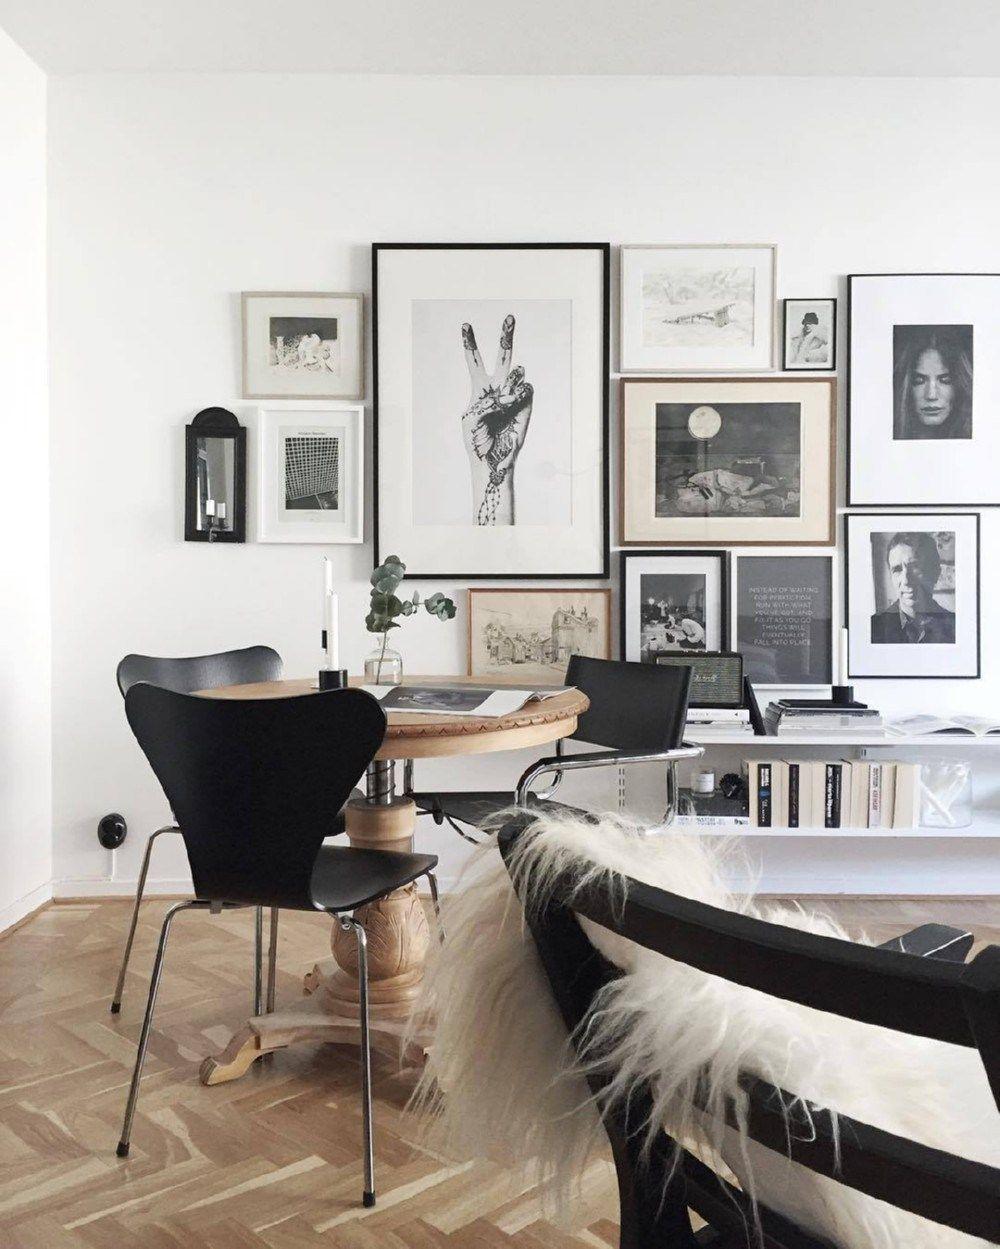 Inspiring Scandinavian Living Room Design 17 Living Room Scandinavian Scandinavian Decor Living Room Scandinavian Design Living Room #scandinavian #inspired #living #room